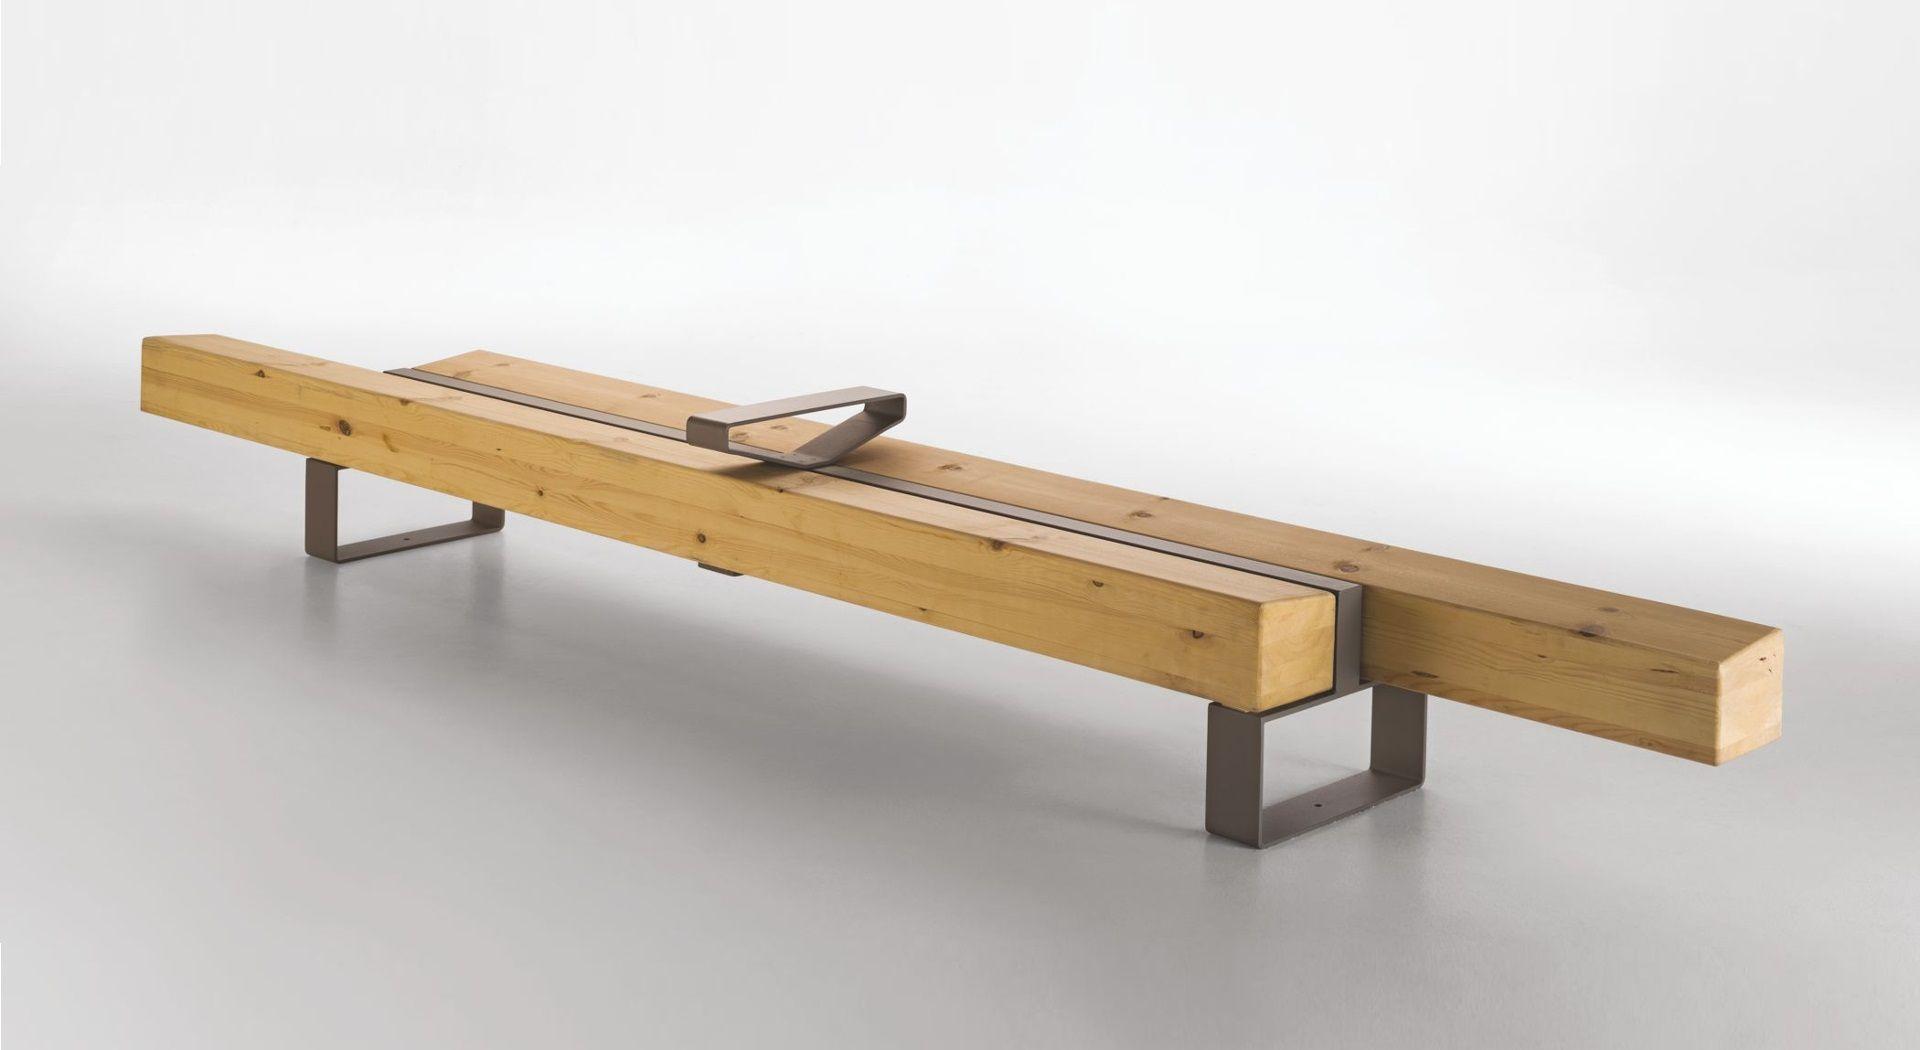 Le Banc Bois Design FORESTA METALCO remporte l'un des GOOD DESIGN AWARD